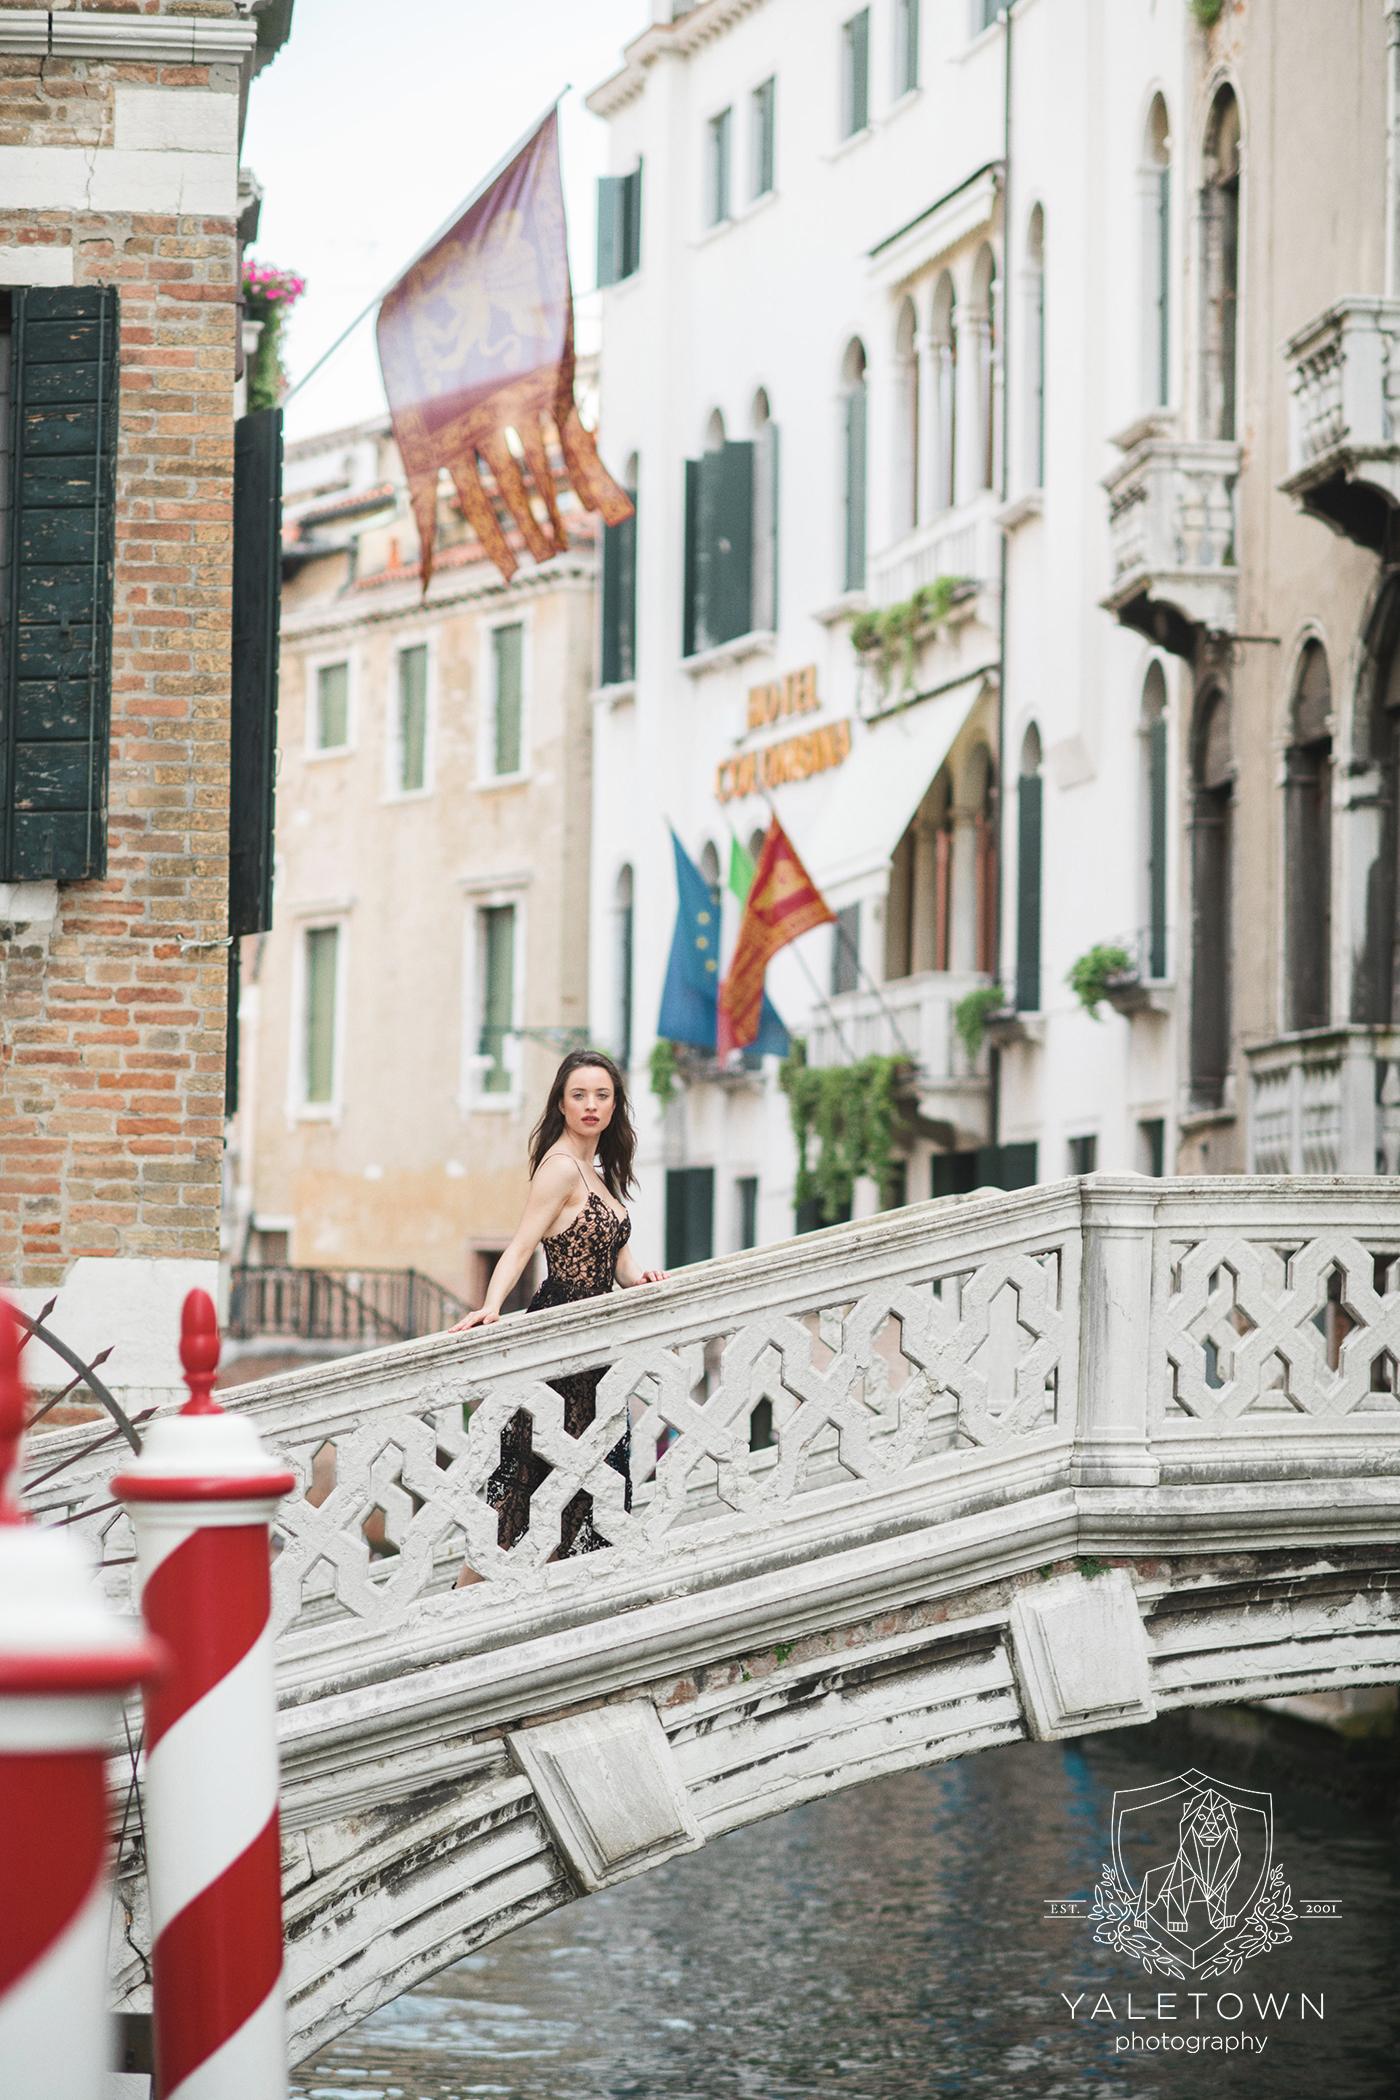 Venice-portrait-session-yaletown-photography-vacation-photographer-photo-016.jpg